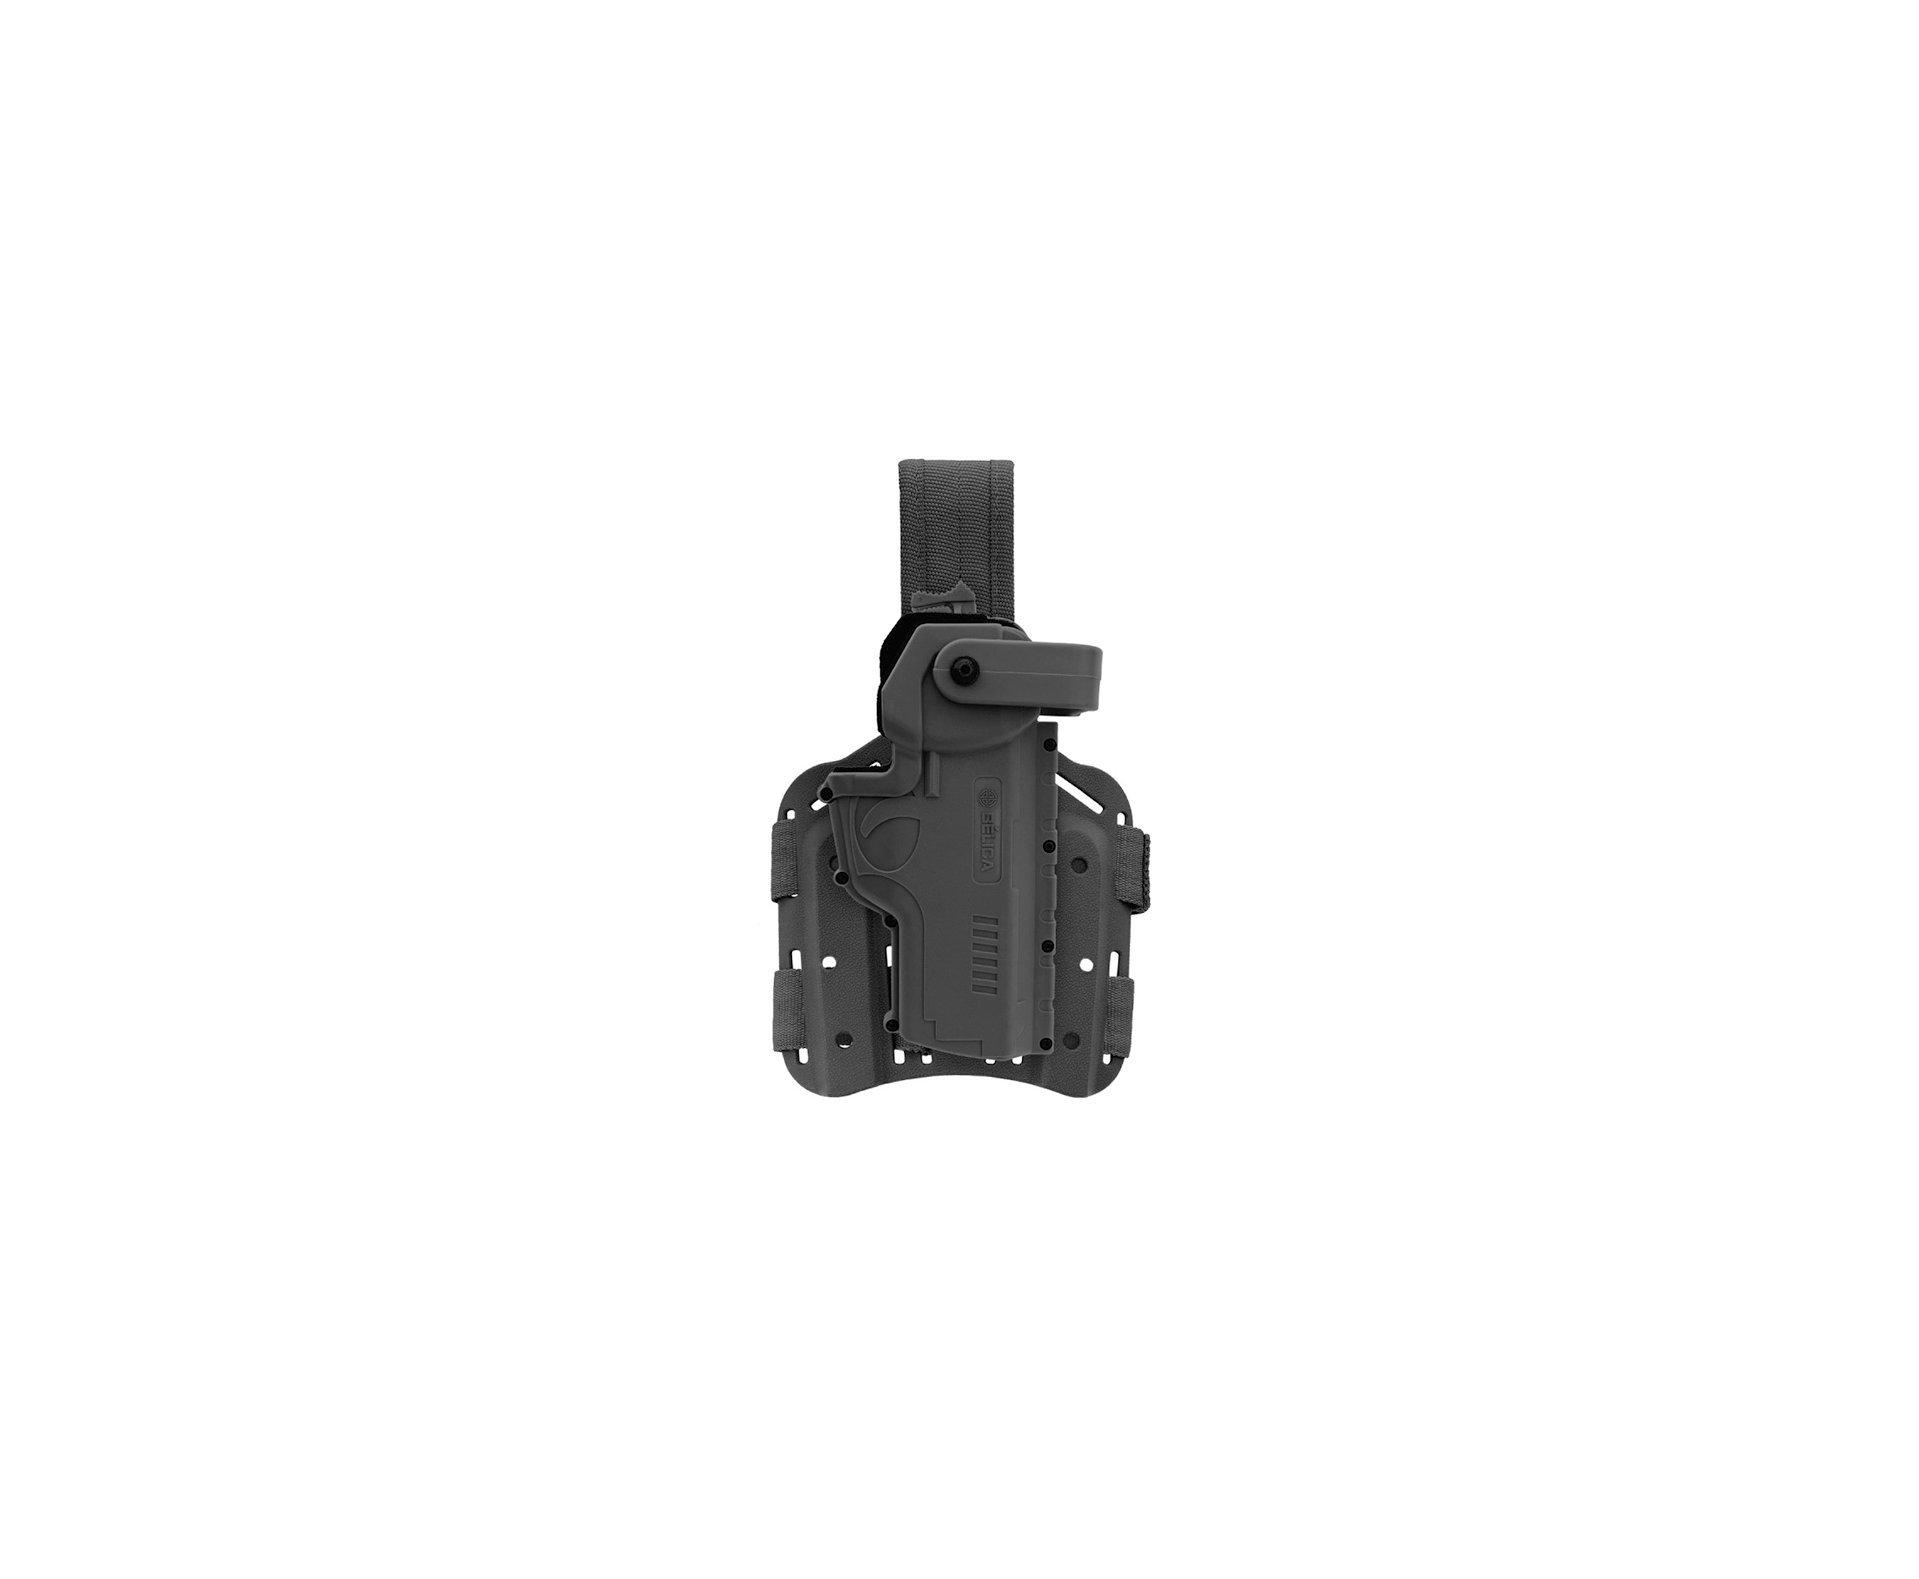 Coldre Hammer Ii De Coxa Em Polímero Pistolas Taurus, Glock, Imbel Canhoto - Belica